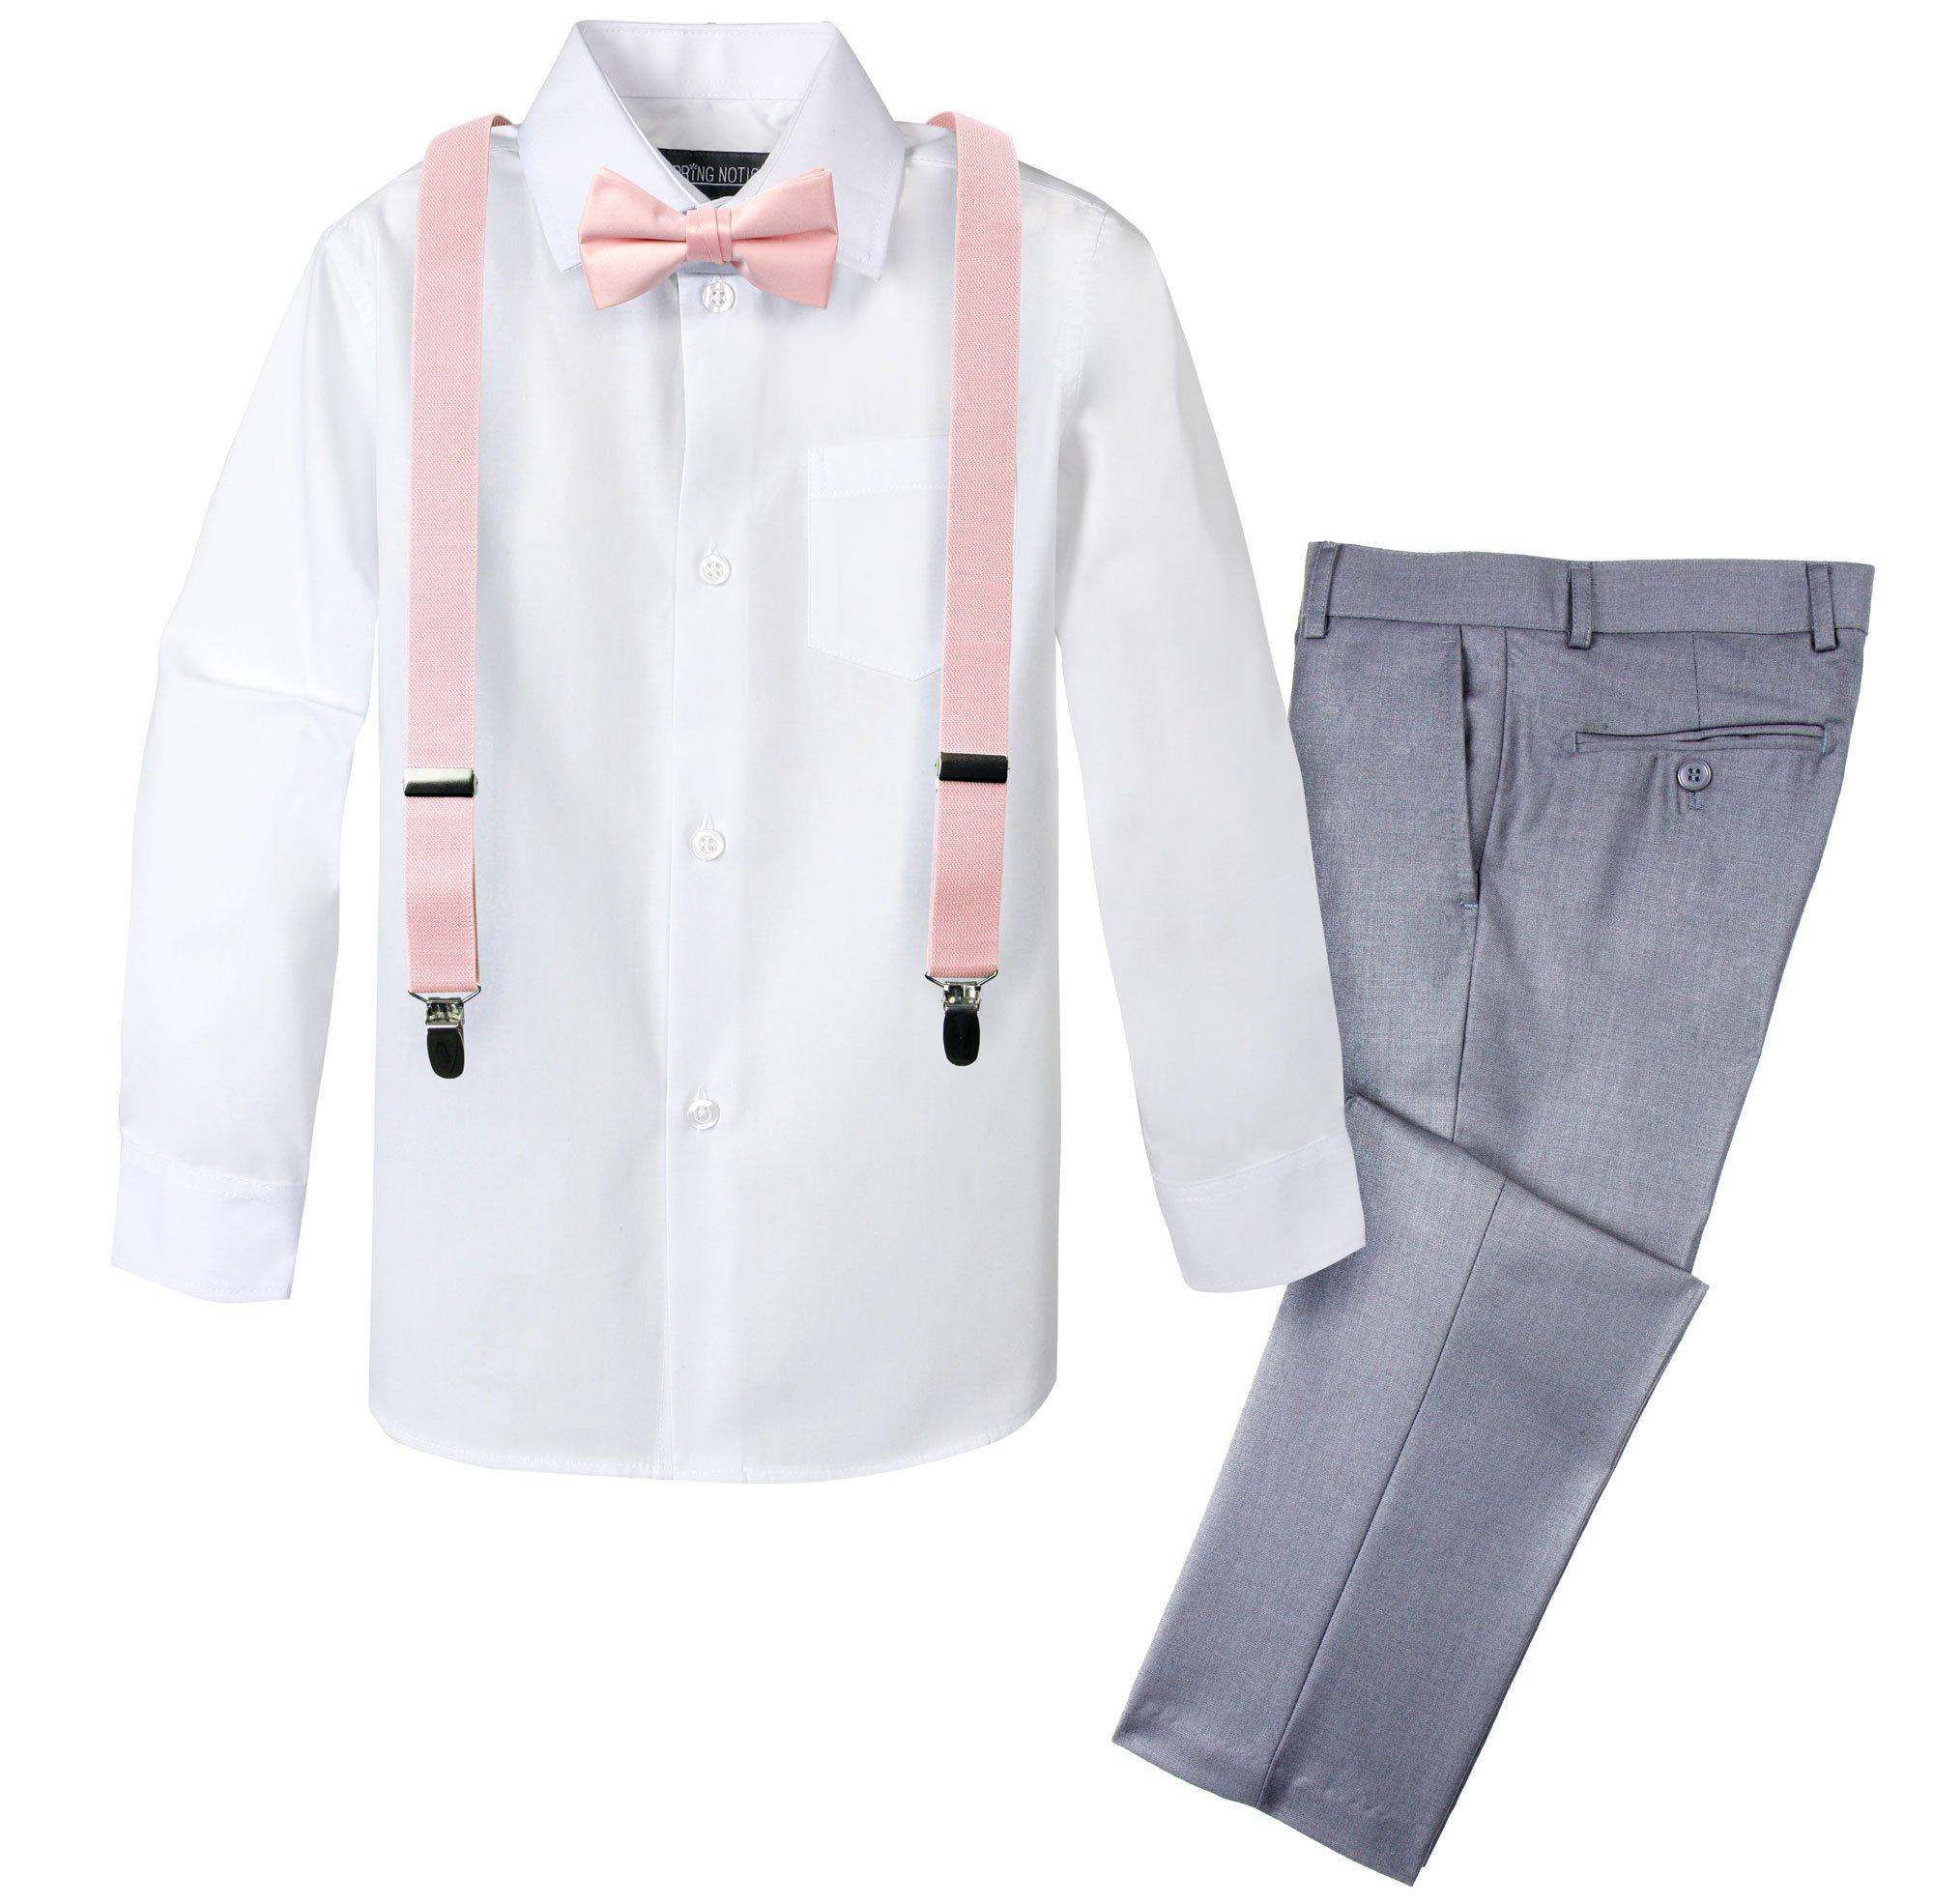 Spring Notion Boys' 4-Piece Dress up Pants Set 4T Light Grey/Blush Pink